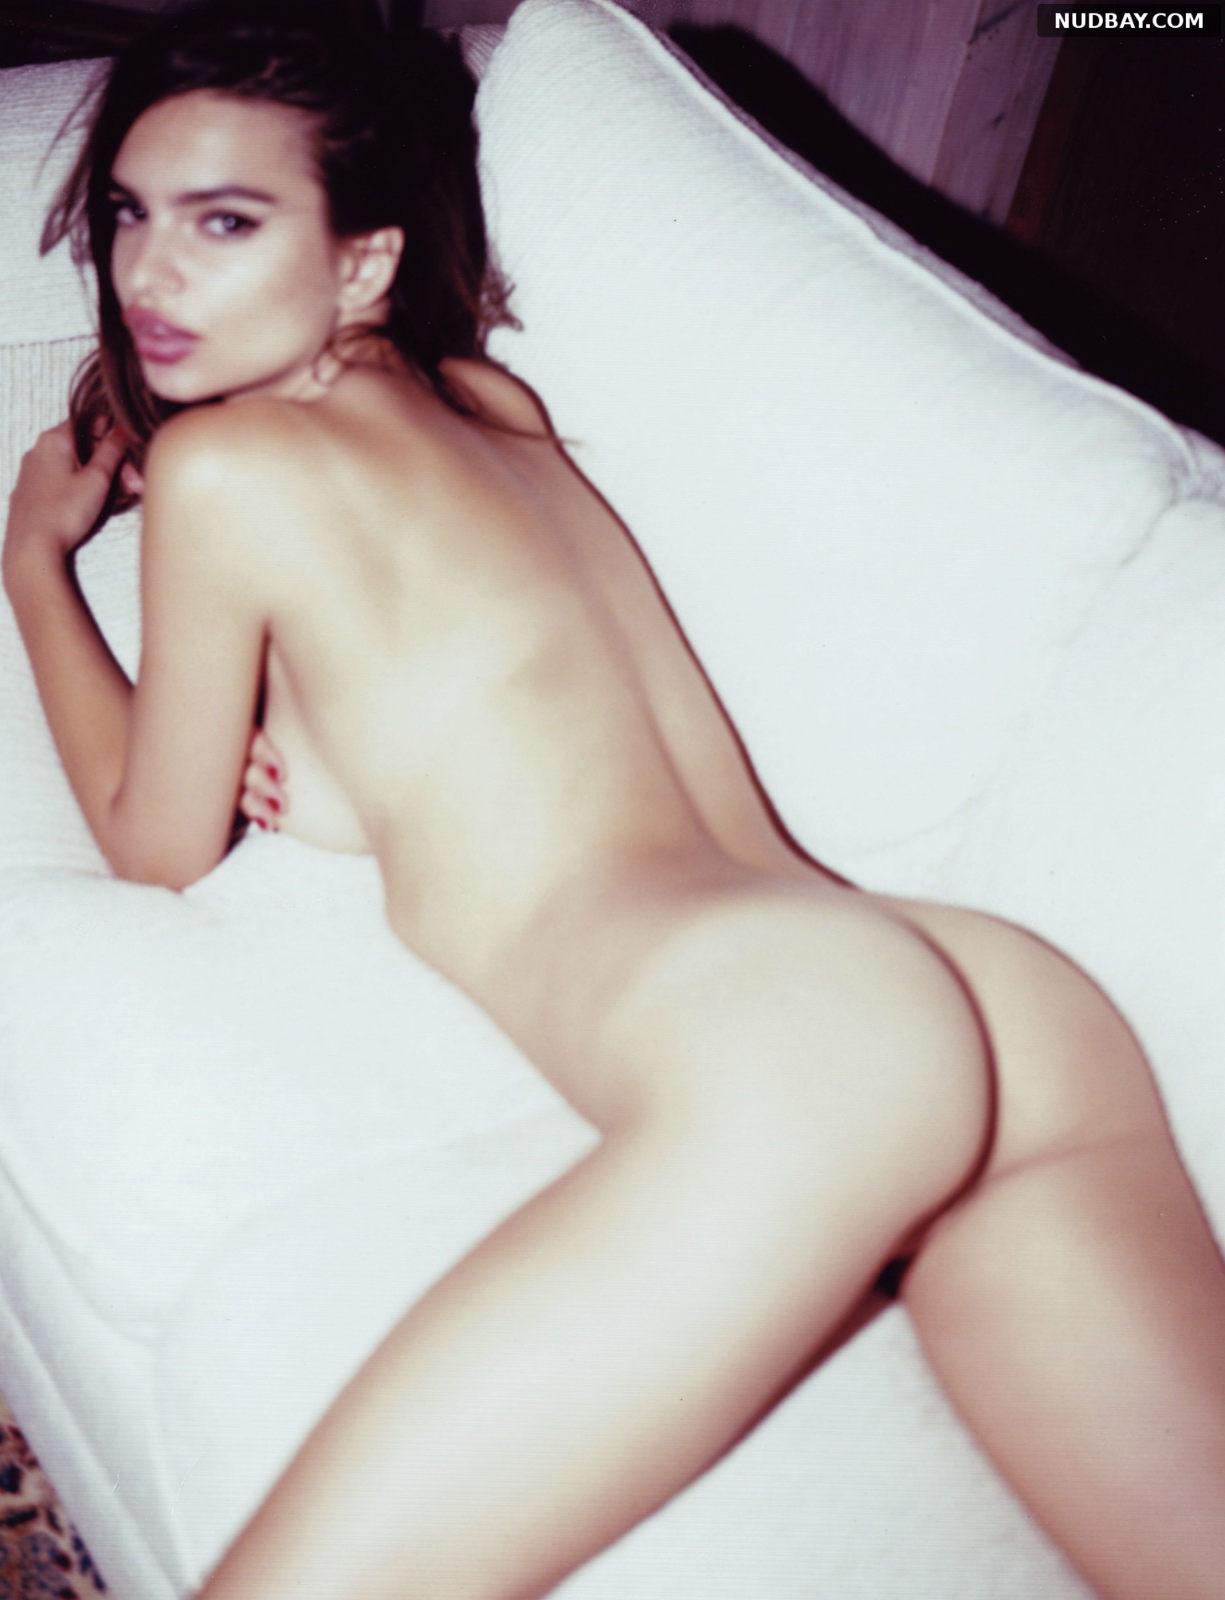 Emily Ratajkowski Lying On The Bed Shows Naked Ass